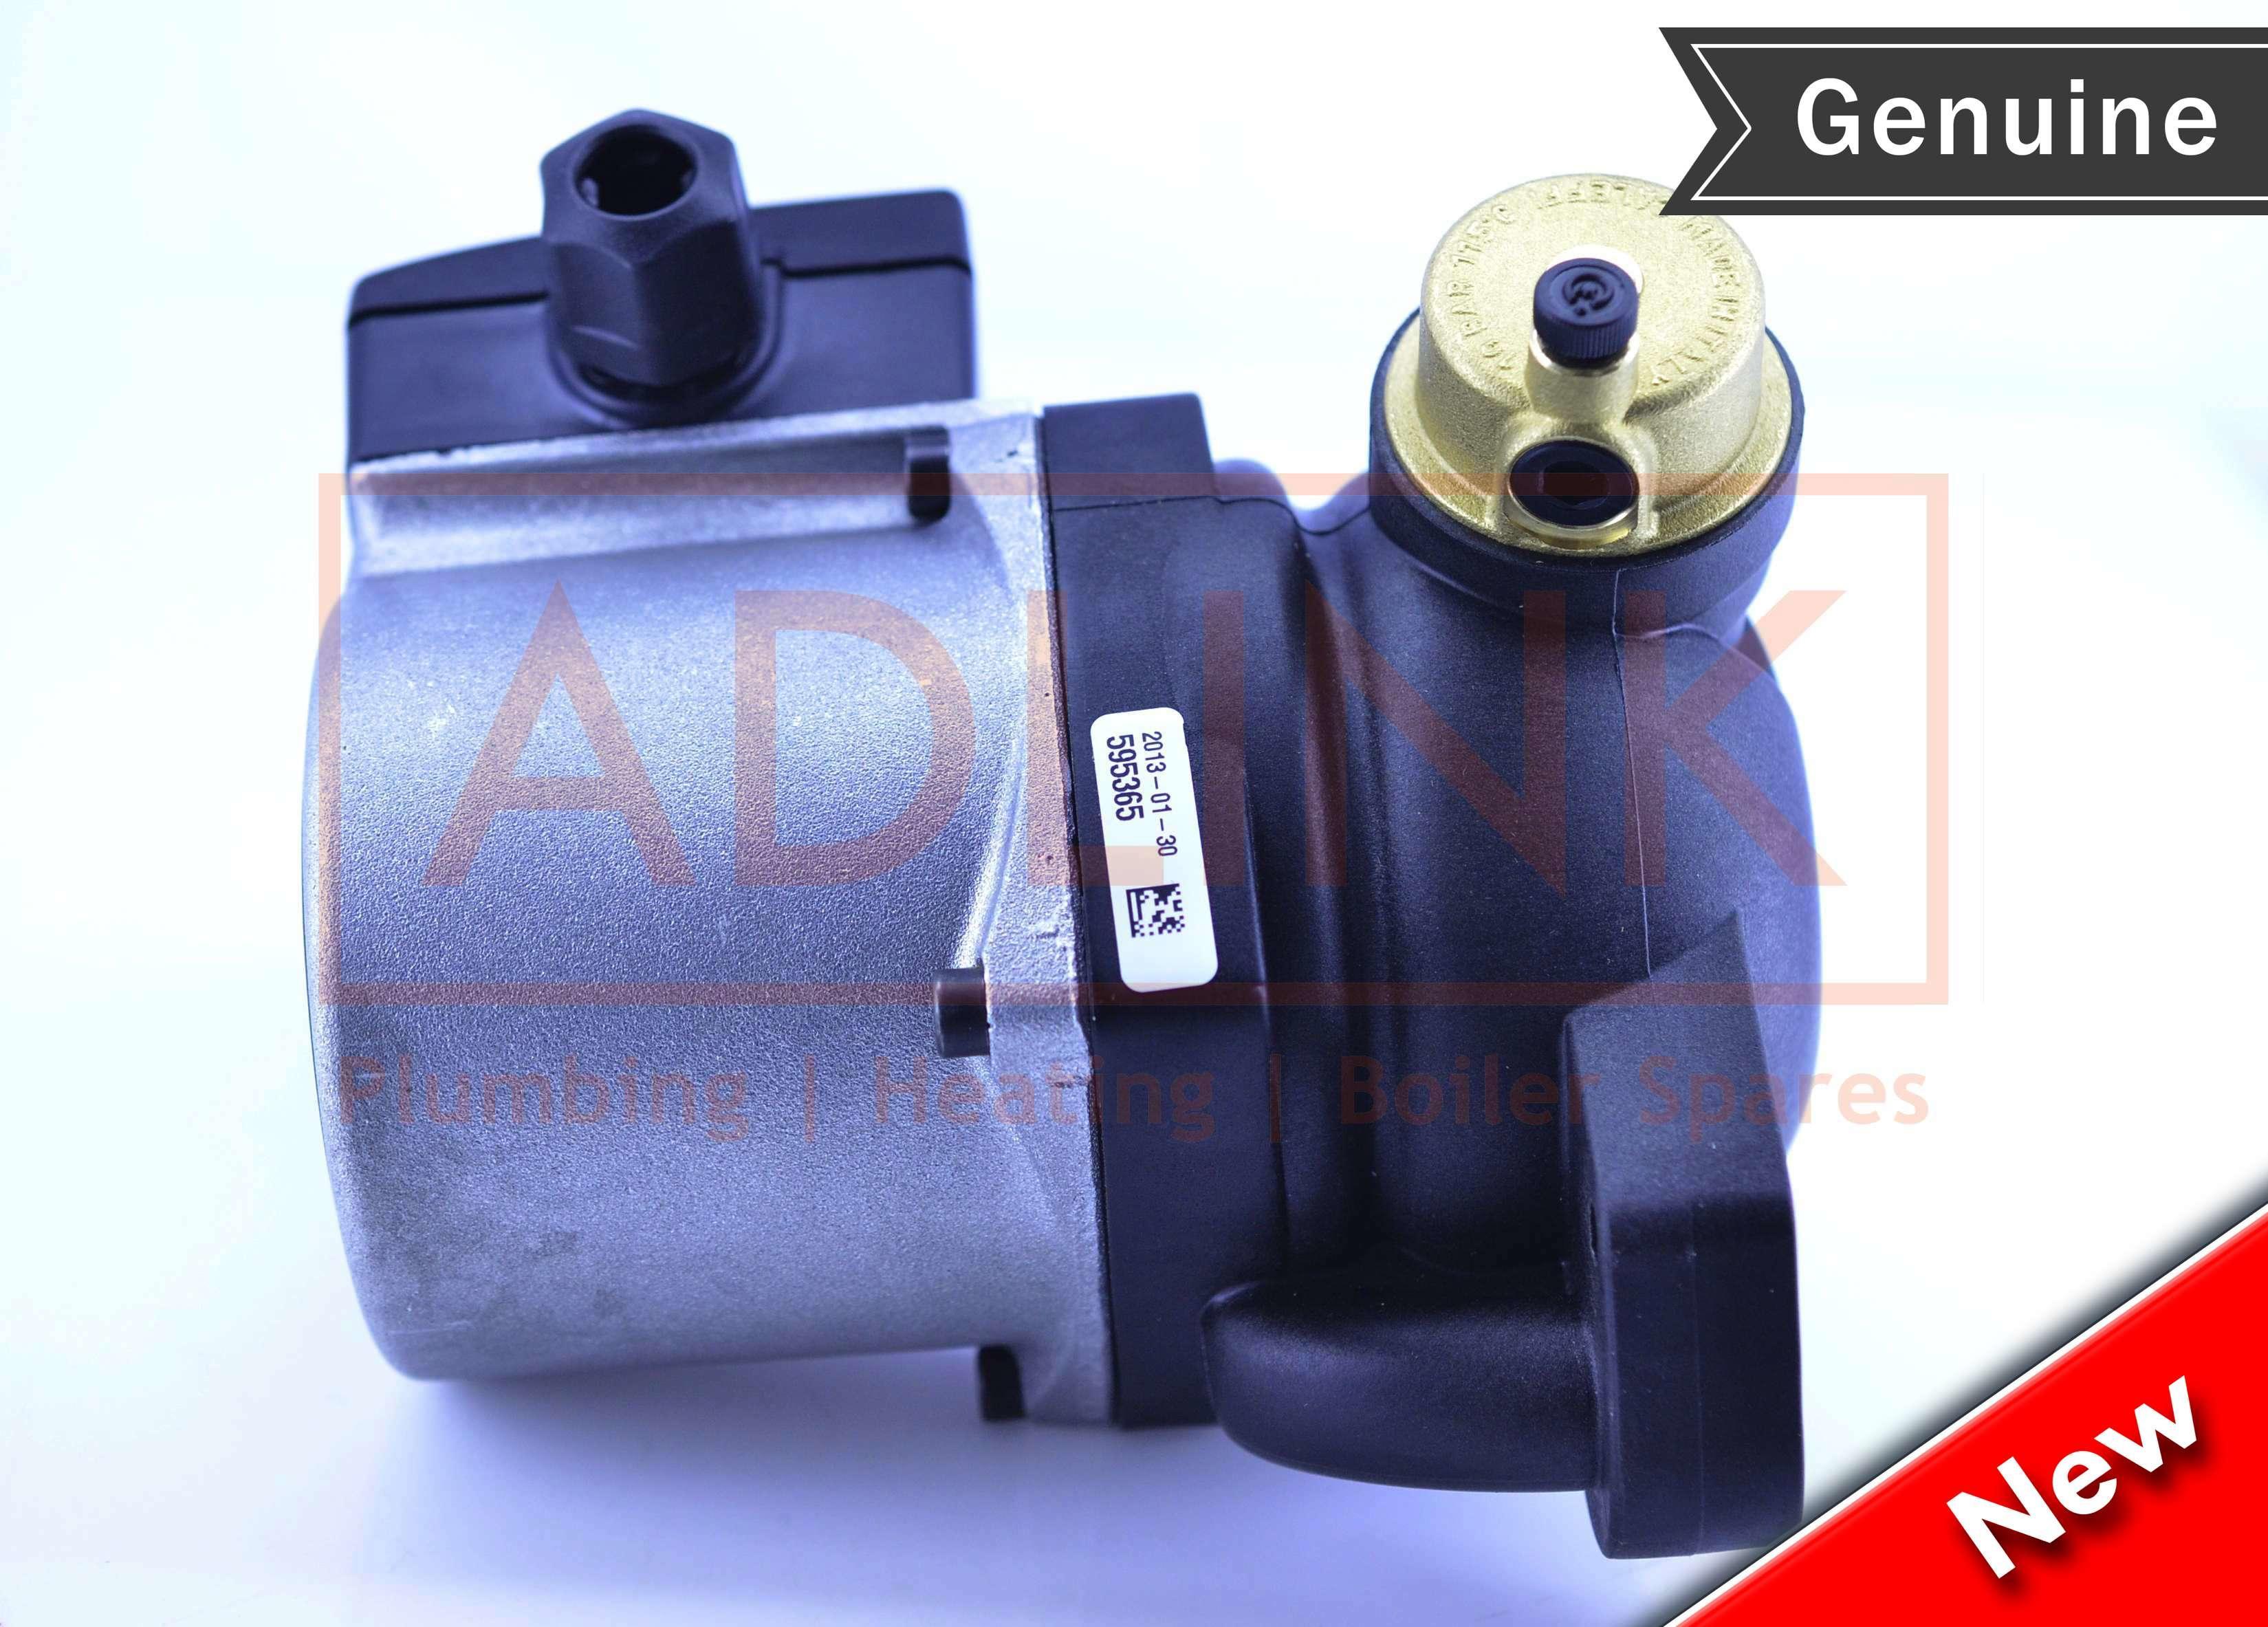 Potterton Titanium 24 28 33 40 Boiler Pump 248042